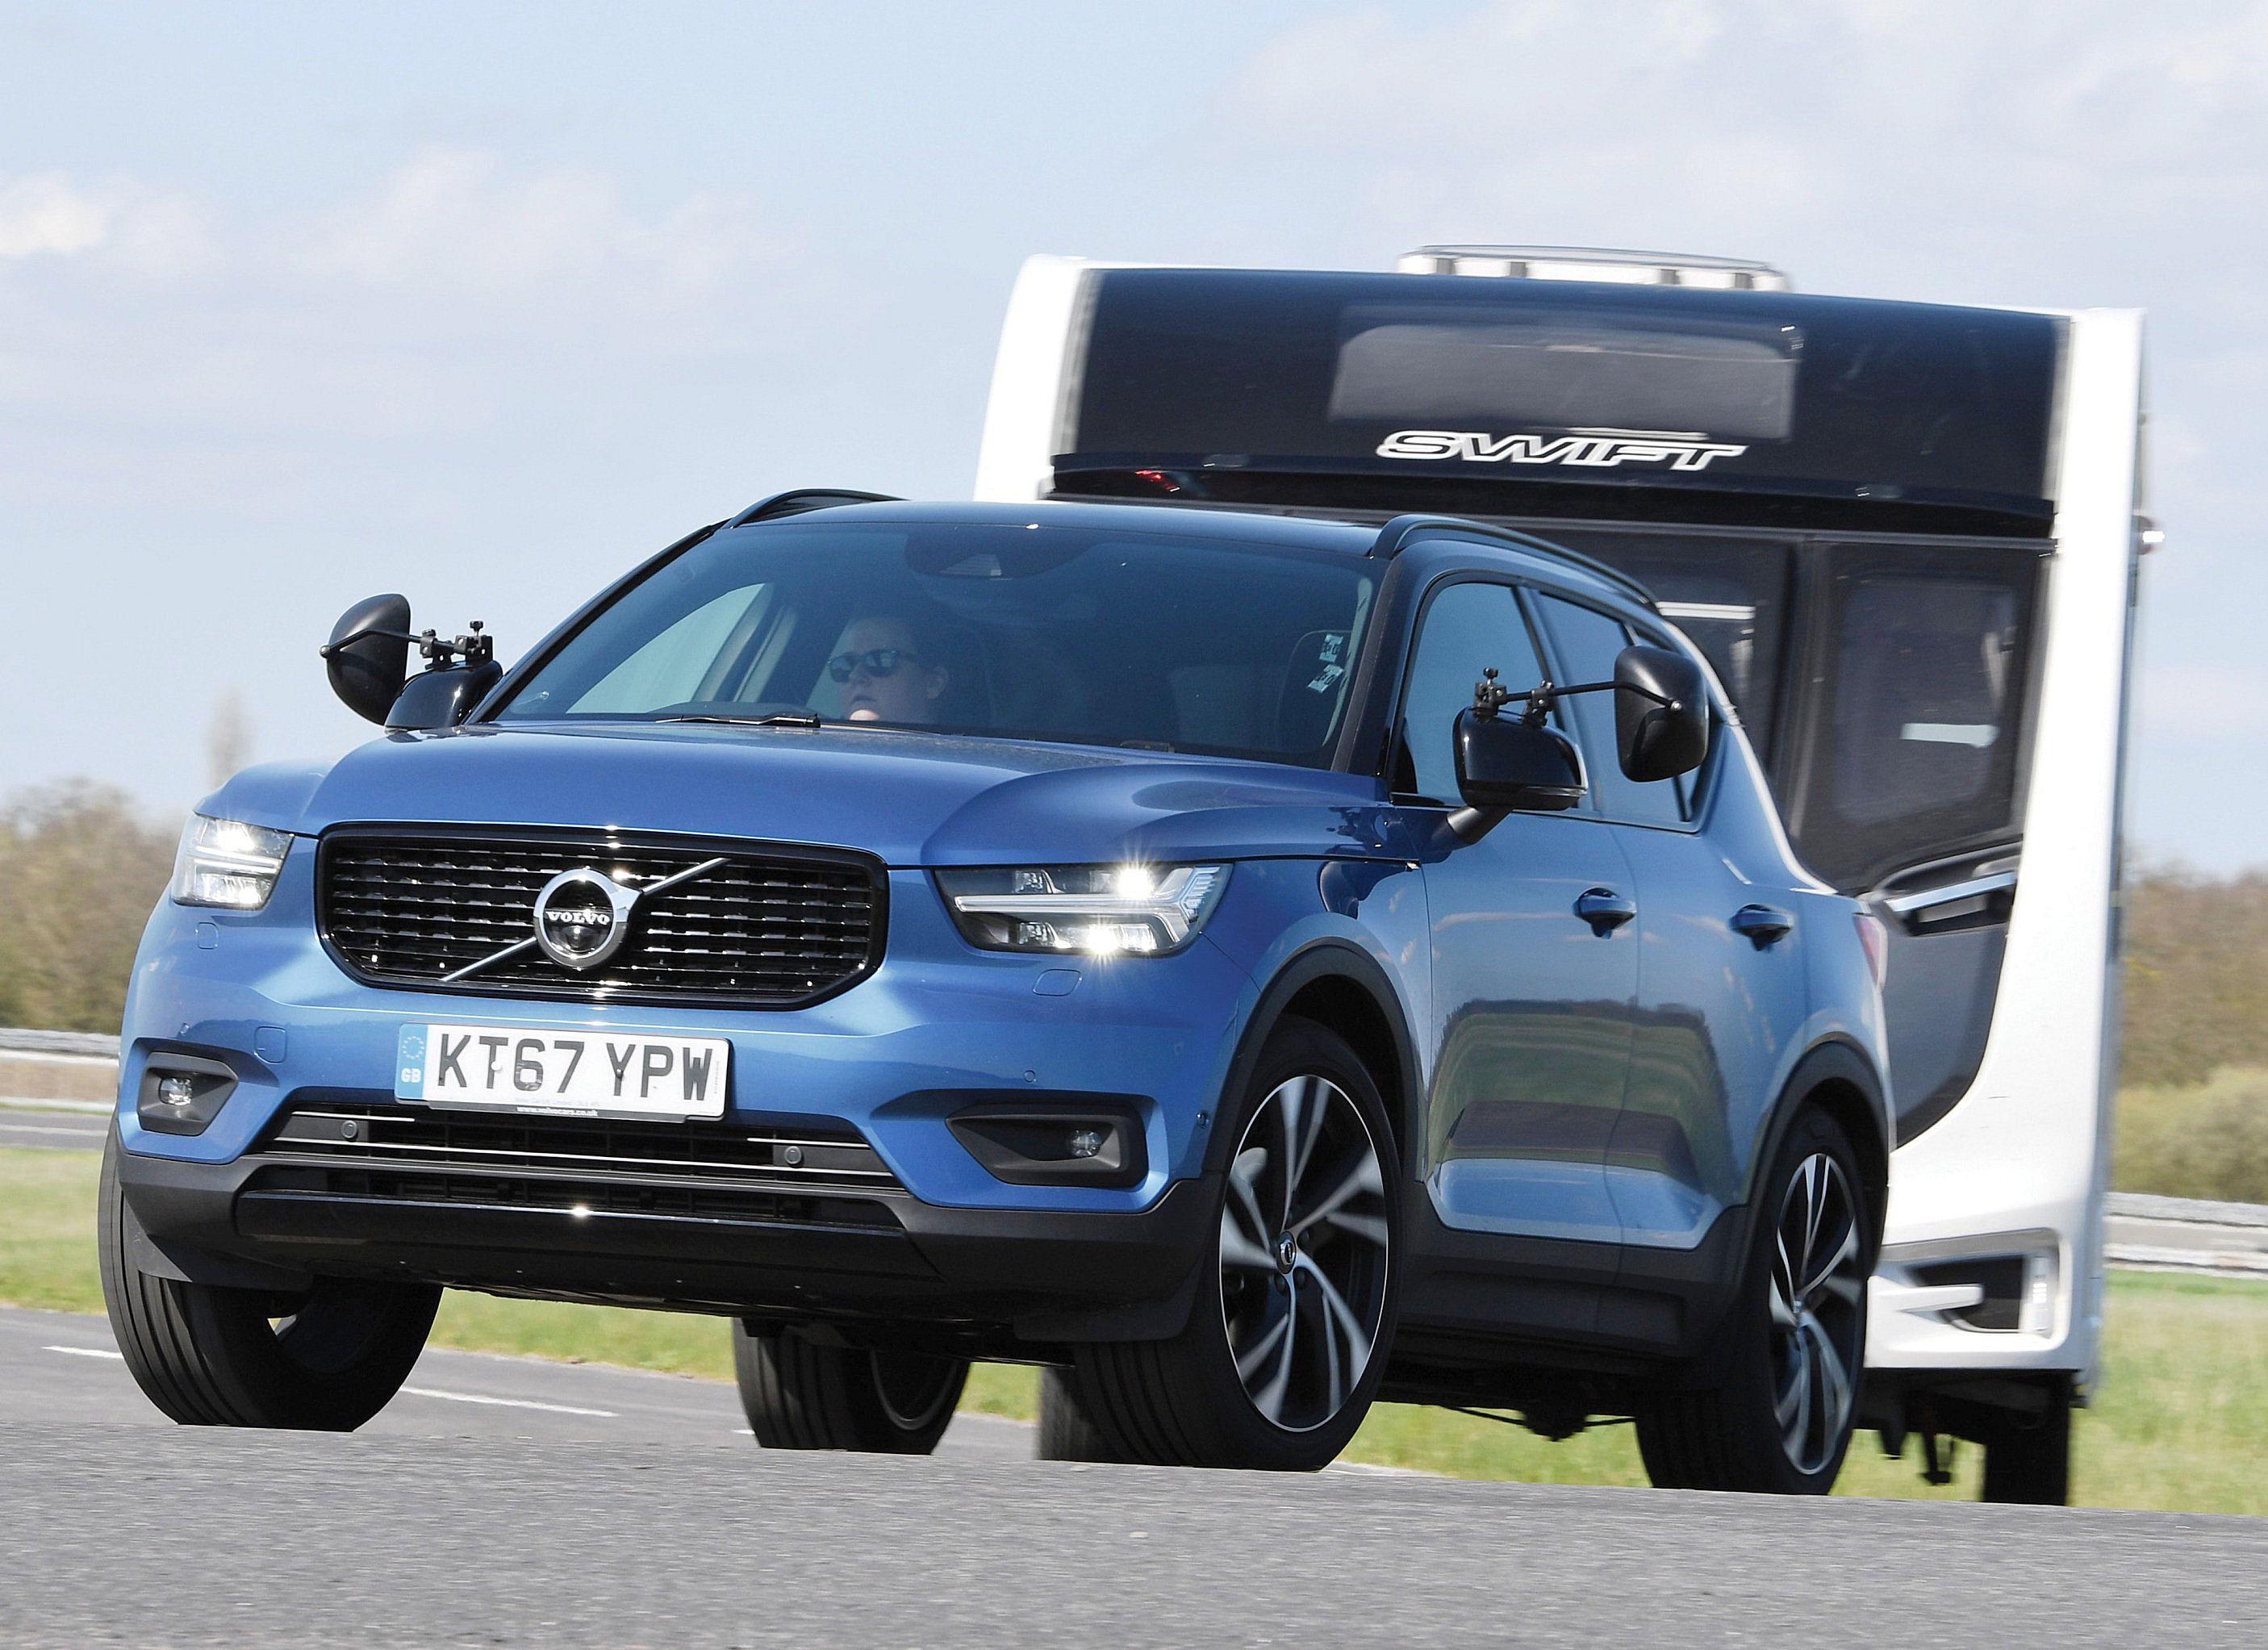 Award Winning Volvo Xc40 Road Test Wheels Alive